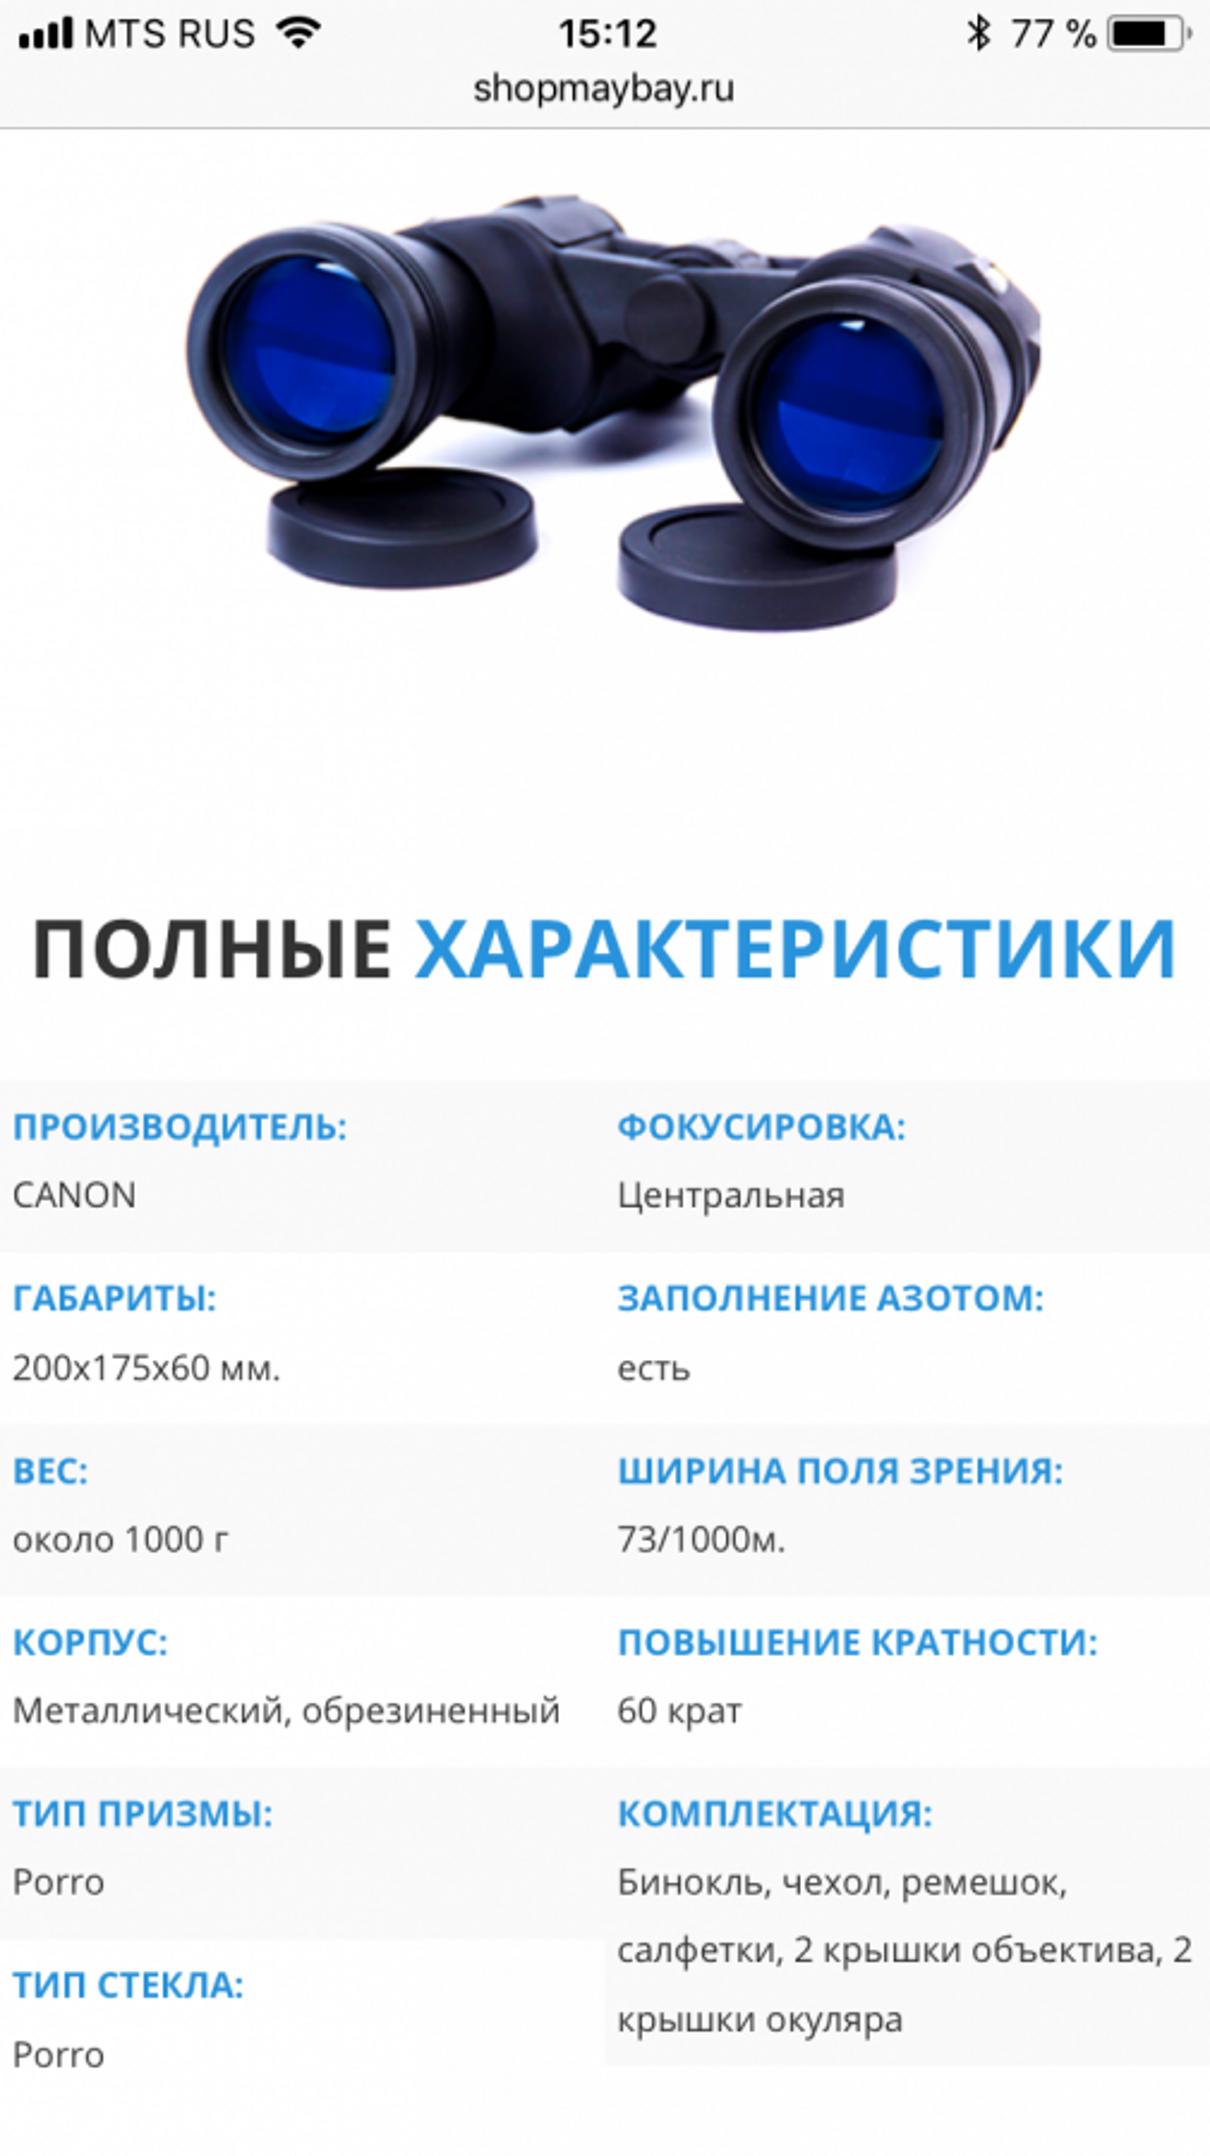 Жалоба-отзыв: Shopmaybay.ru - Обман.  Фото №1